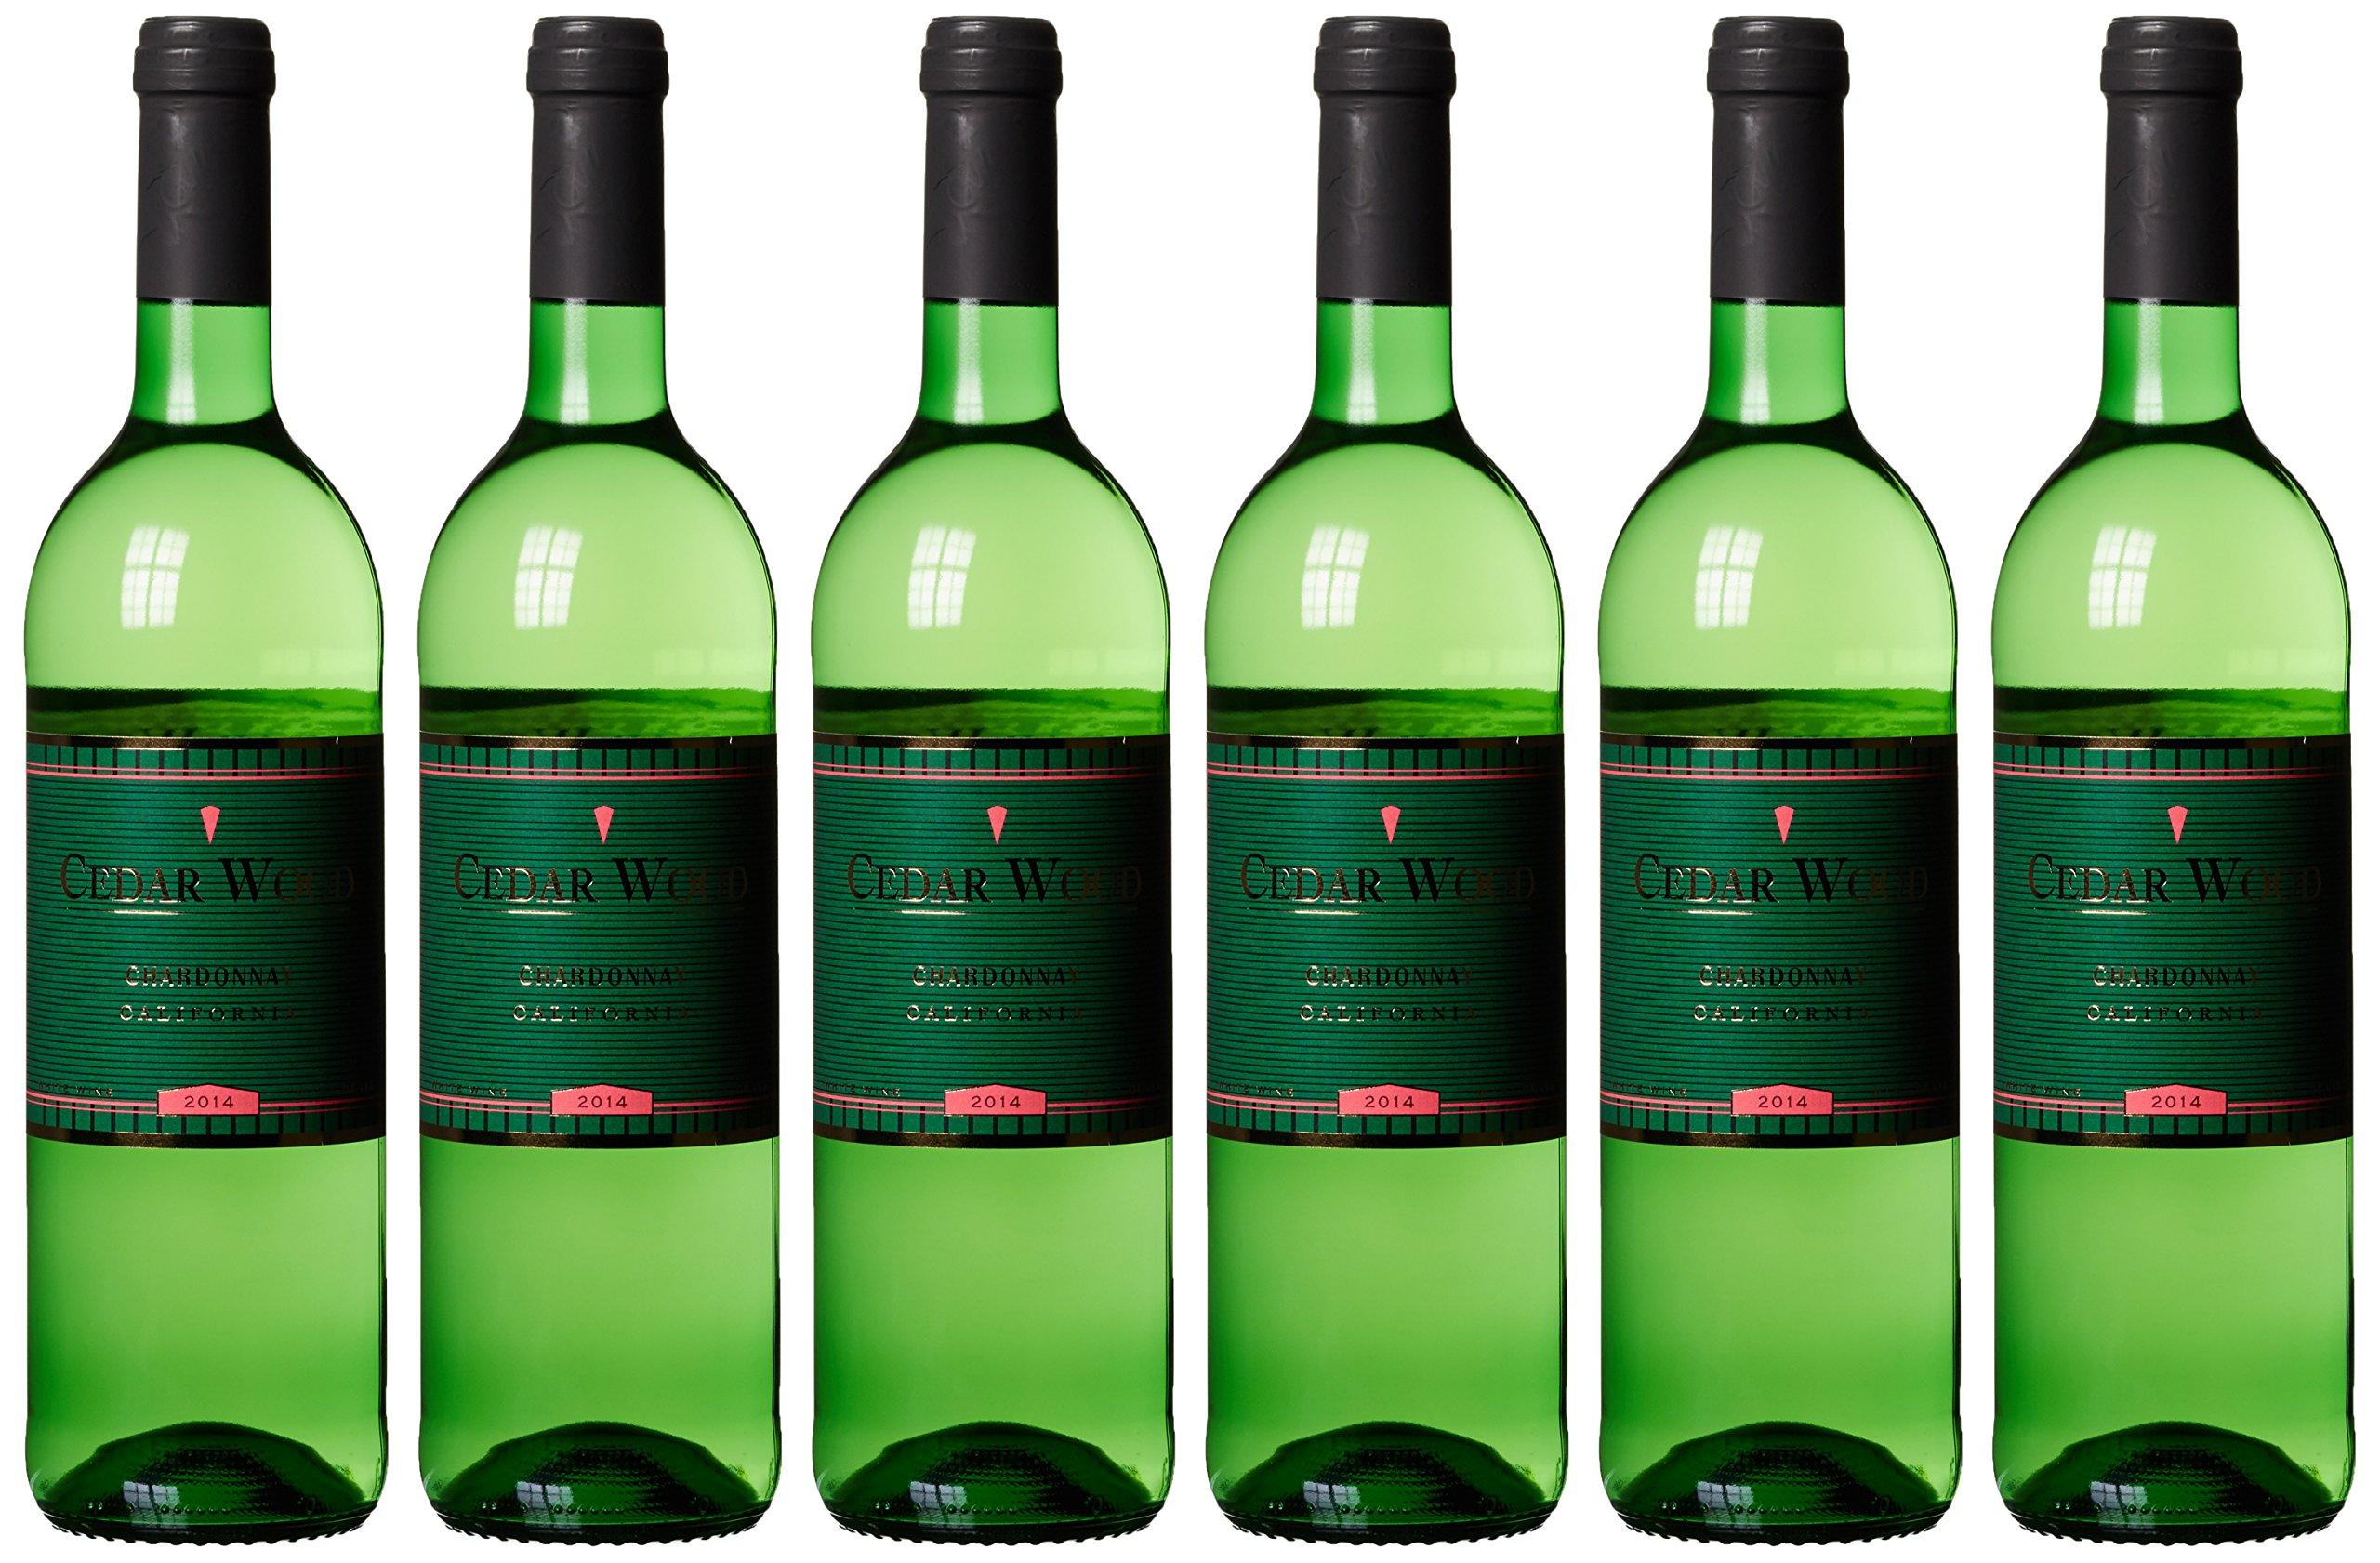 Cedar-Wood-Chardonnay-trocken-6-x-075-l